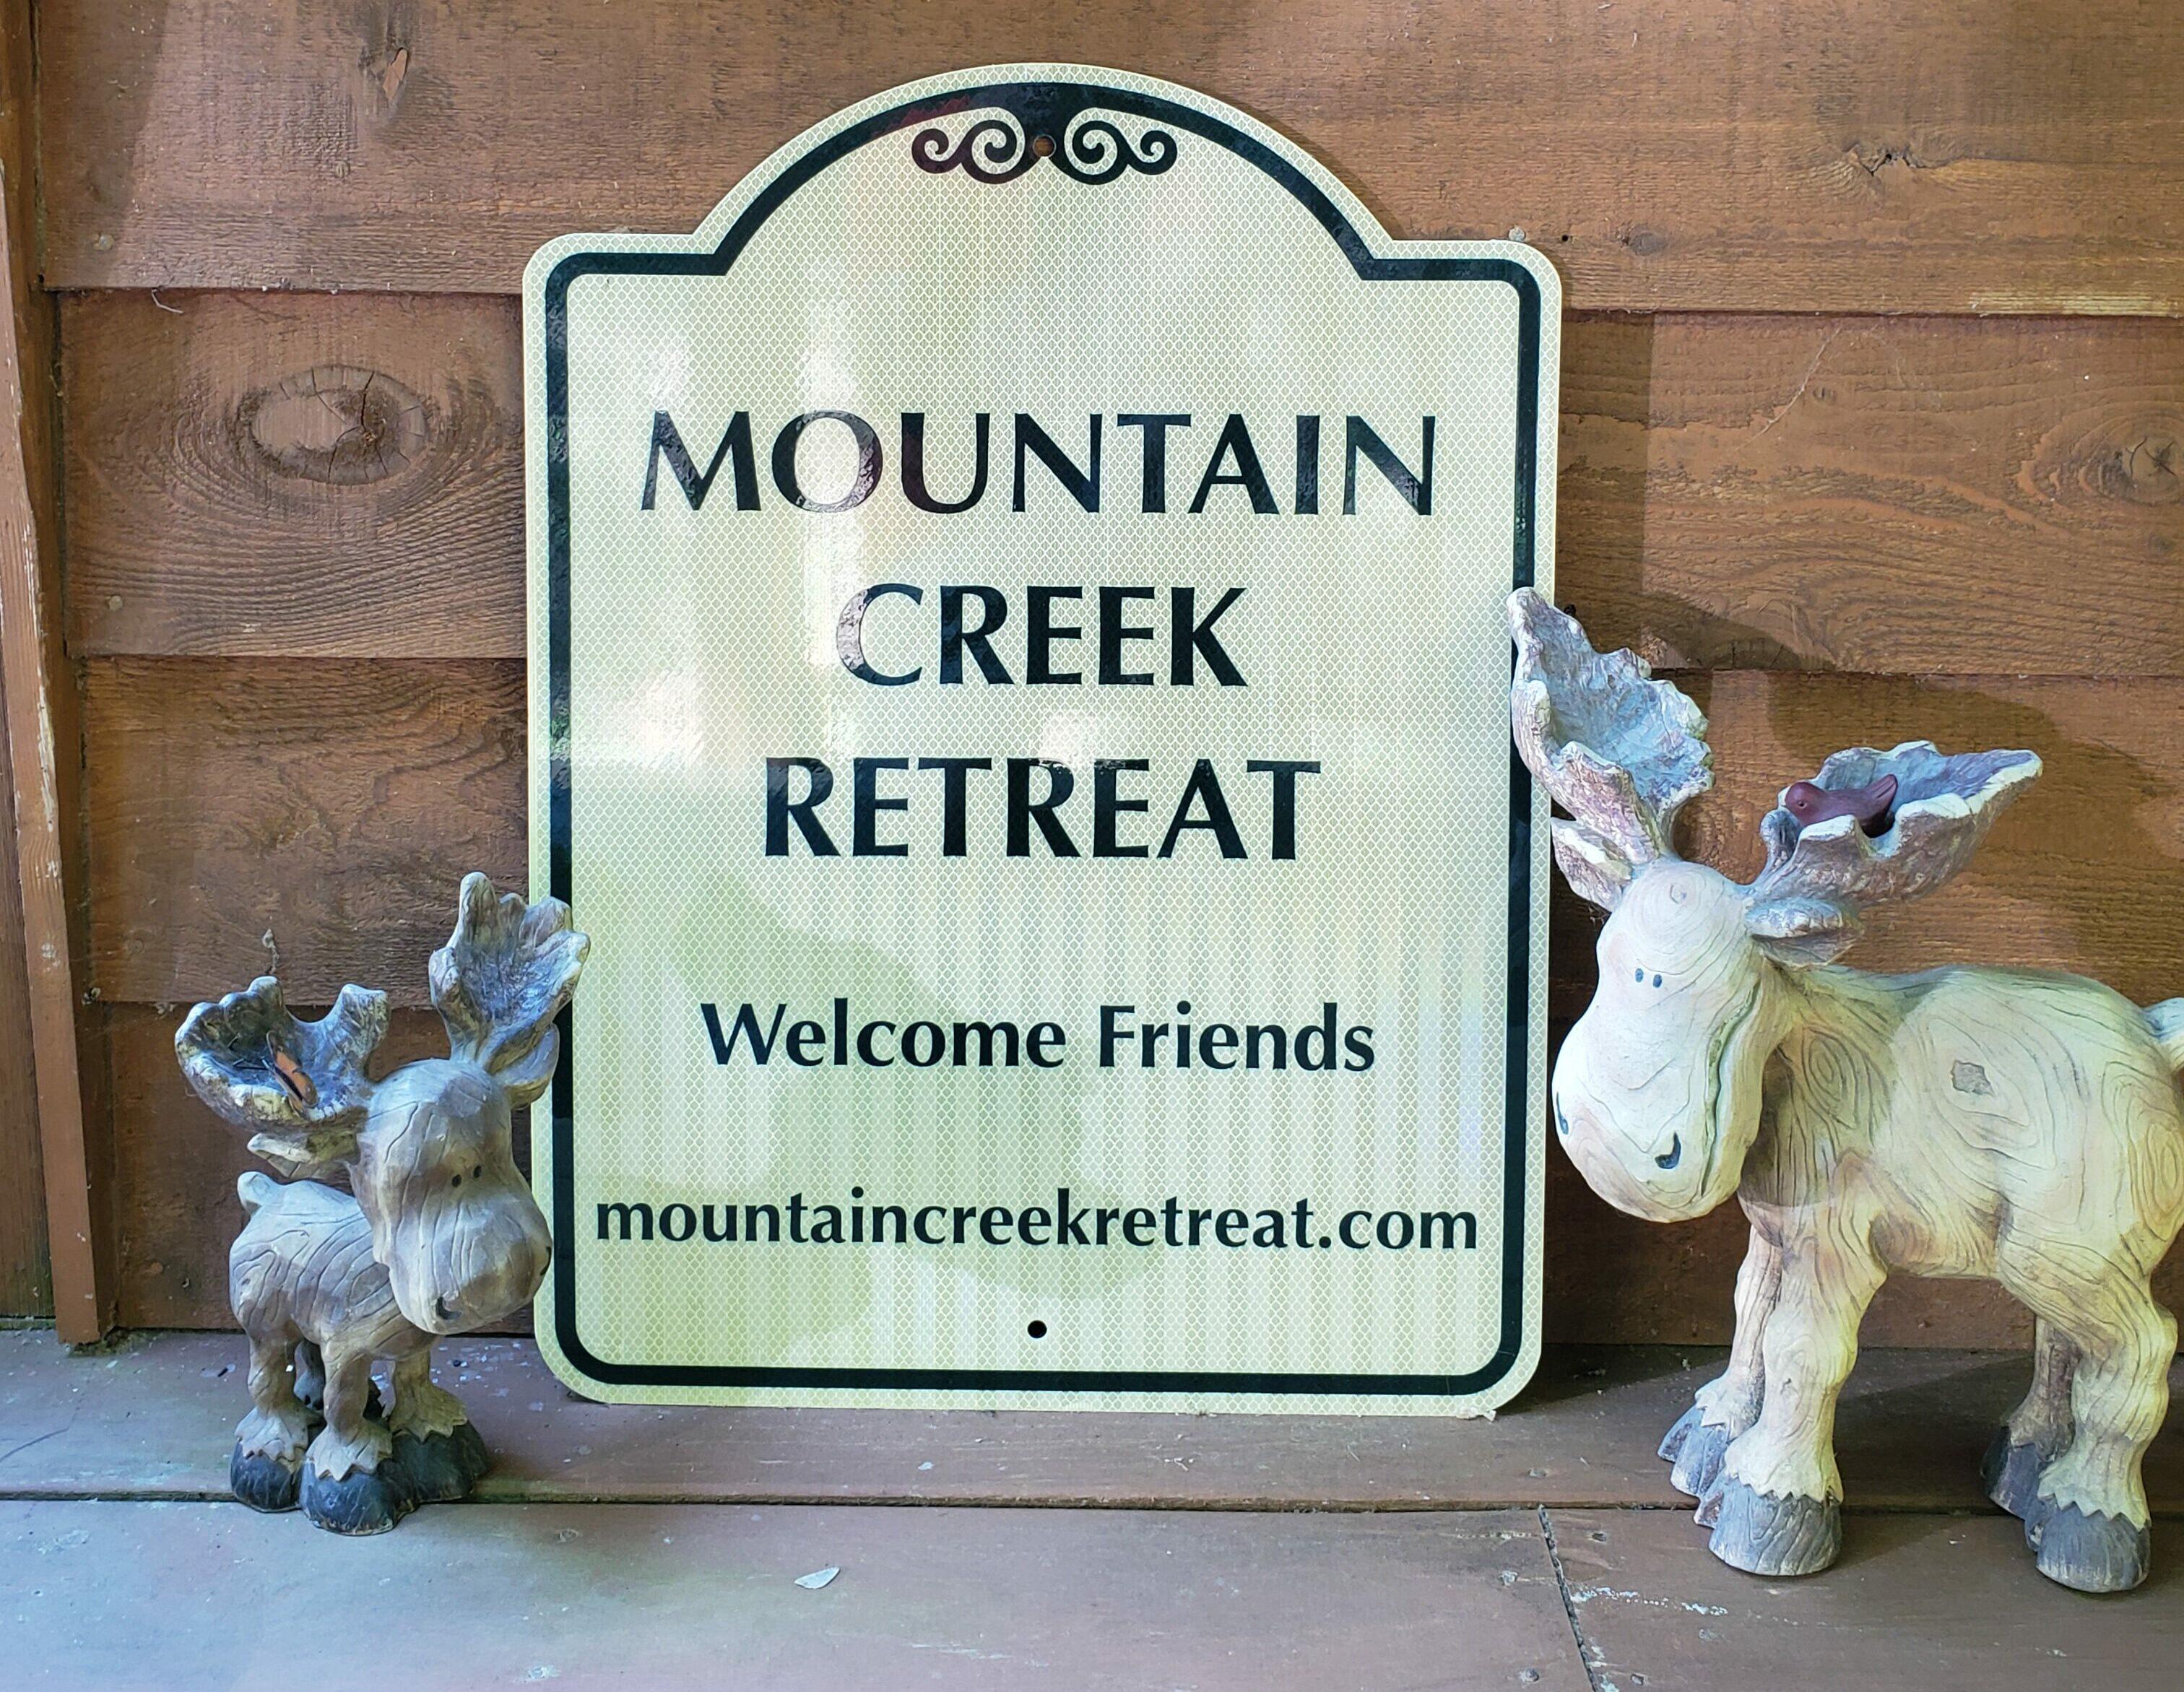 Mountain Creek Retreat